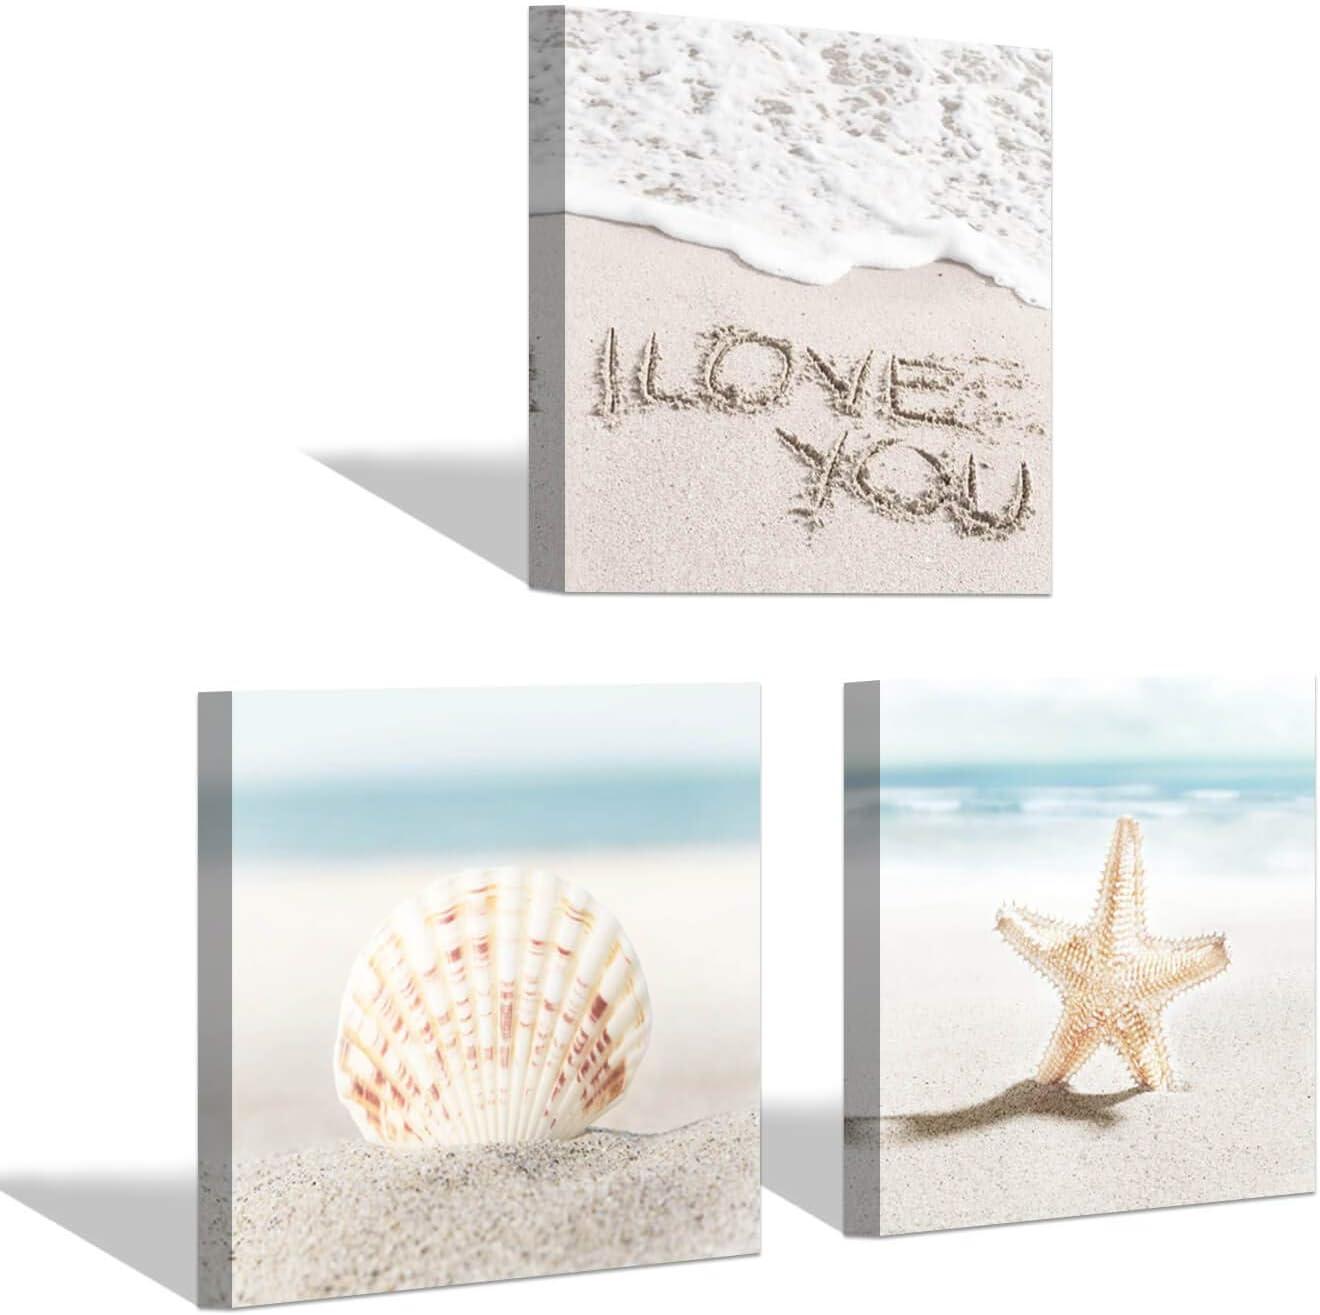 Beach Wall Art Canvas Prints - Set of 3 Nautical Decorations Ocean Starfish Seashell Pictures for Bedroom & Bathroom Decor (12''x12''x3)